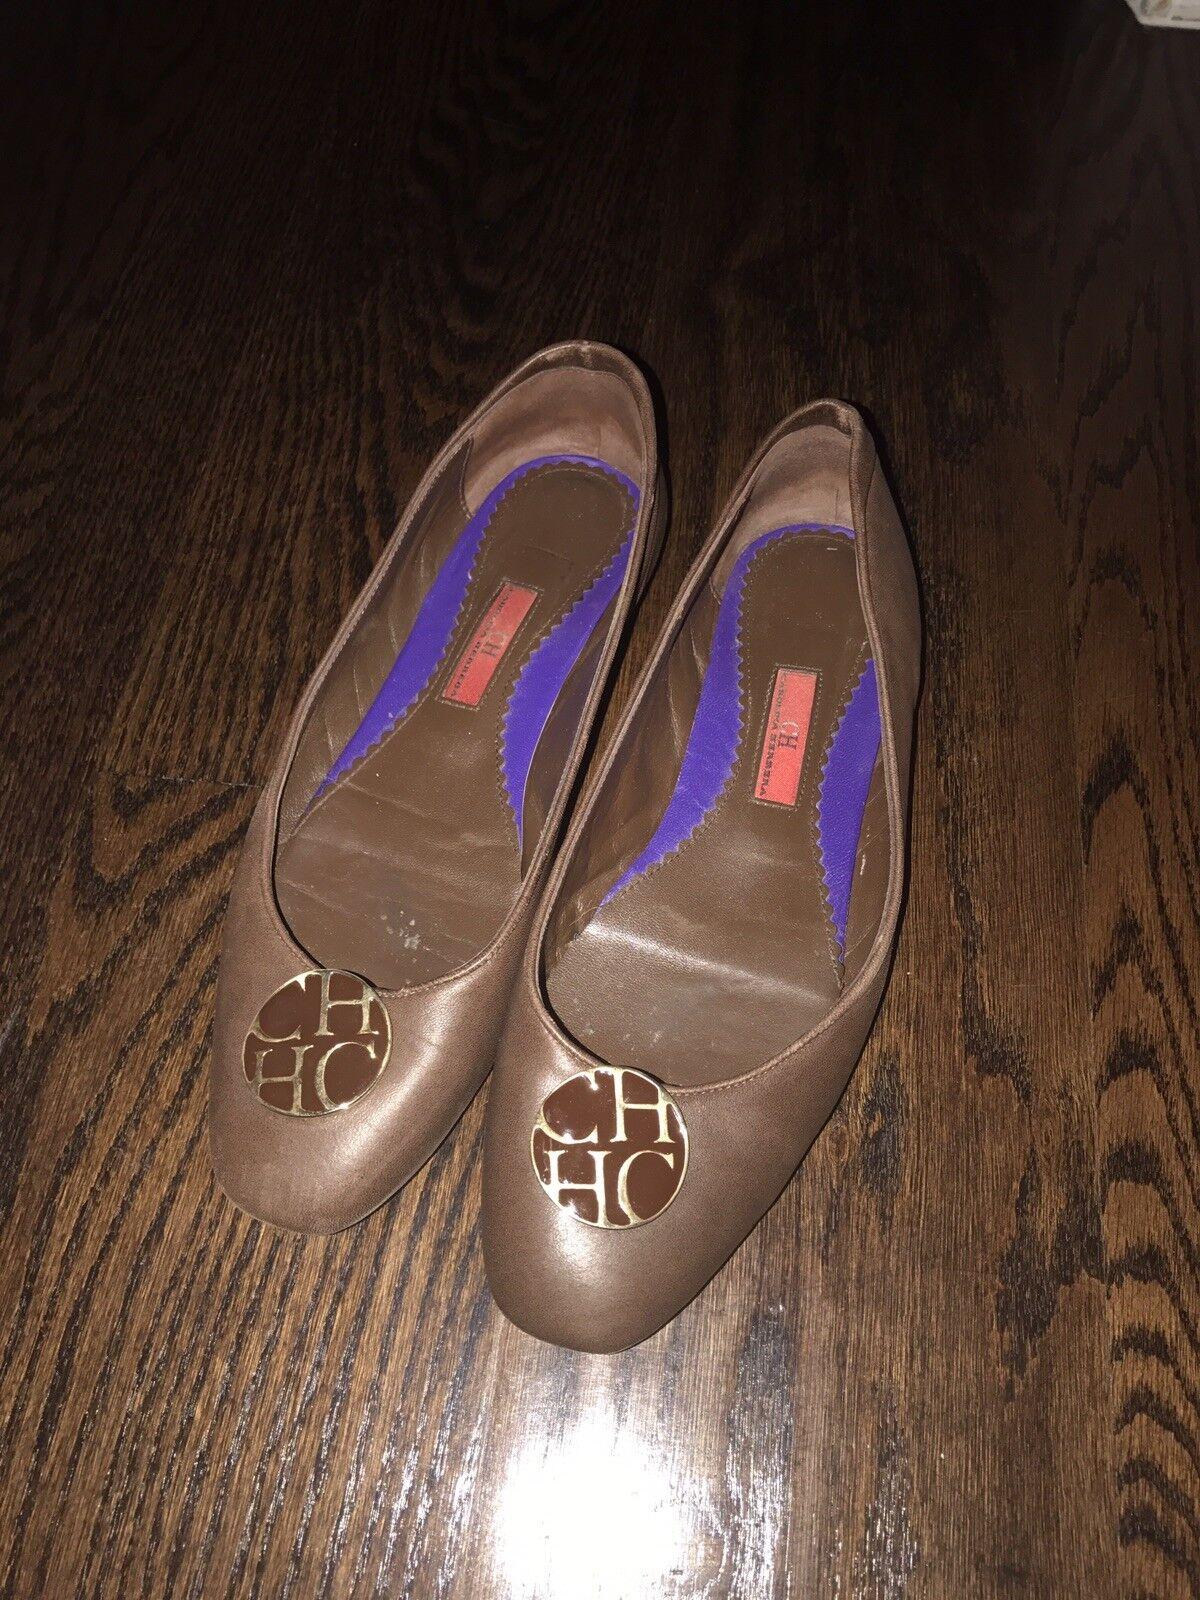 Carolina Herrera Brown Ballet Flats Shoes 9 CH Logo Size 9 Shoes 76cc58